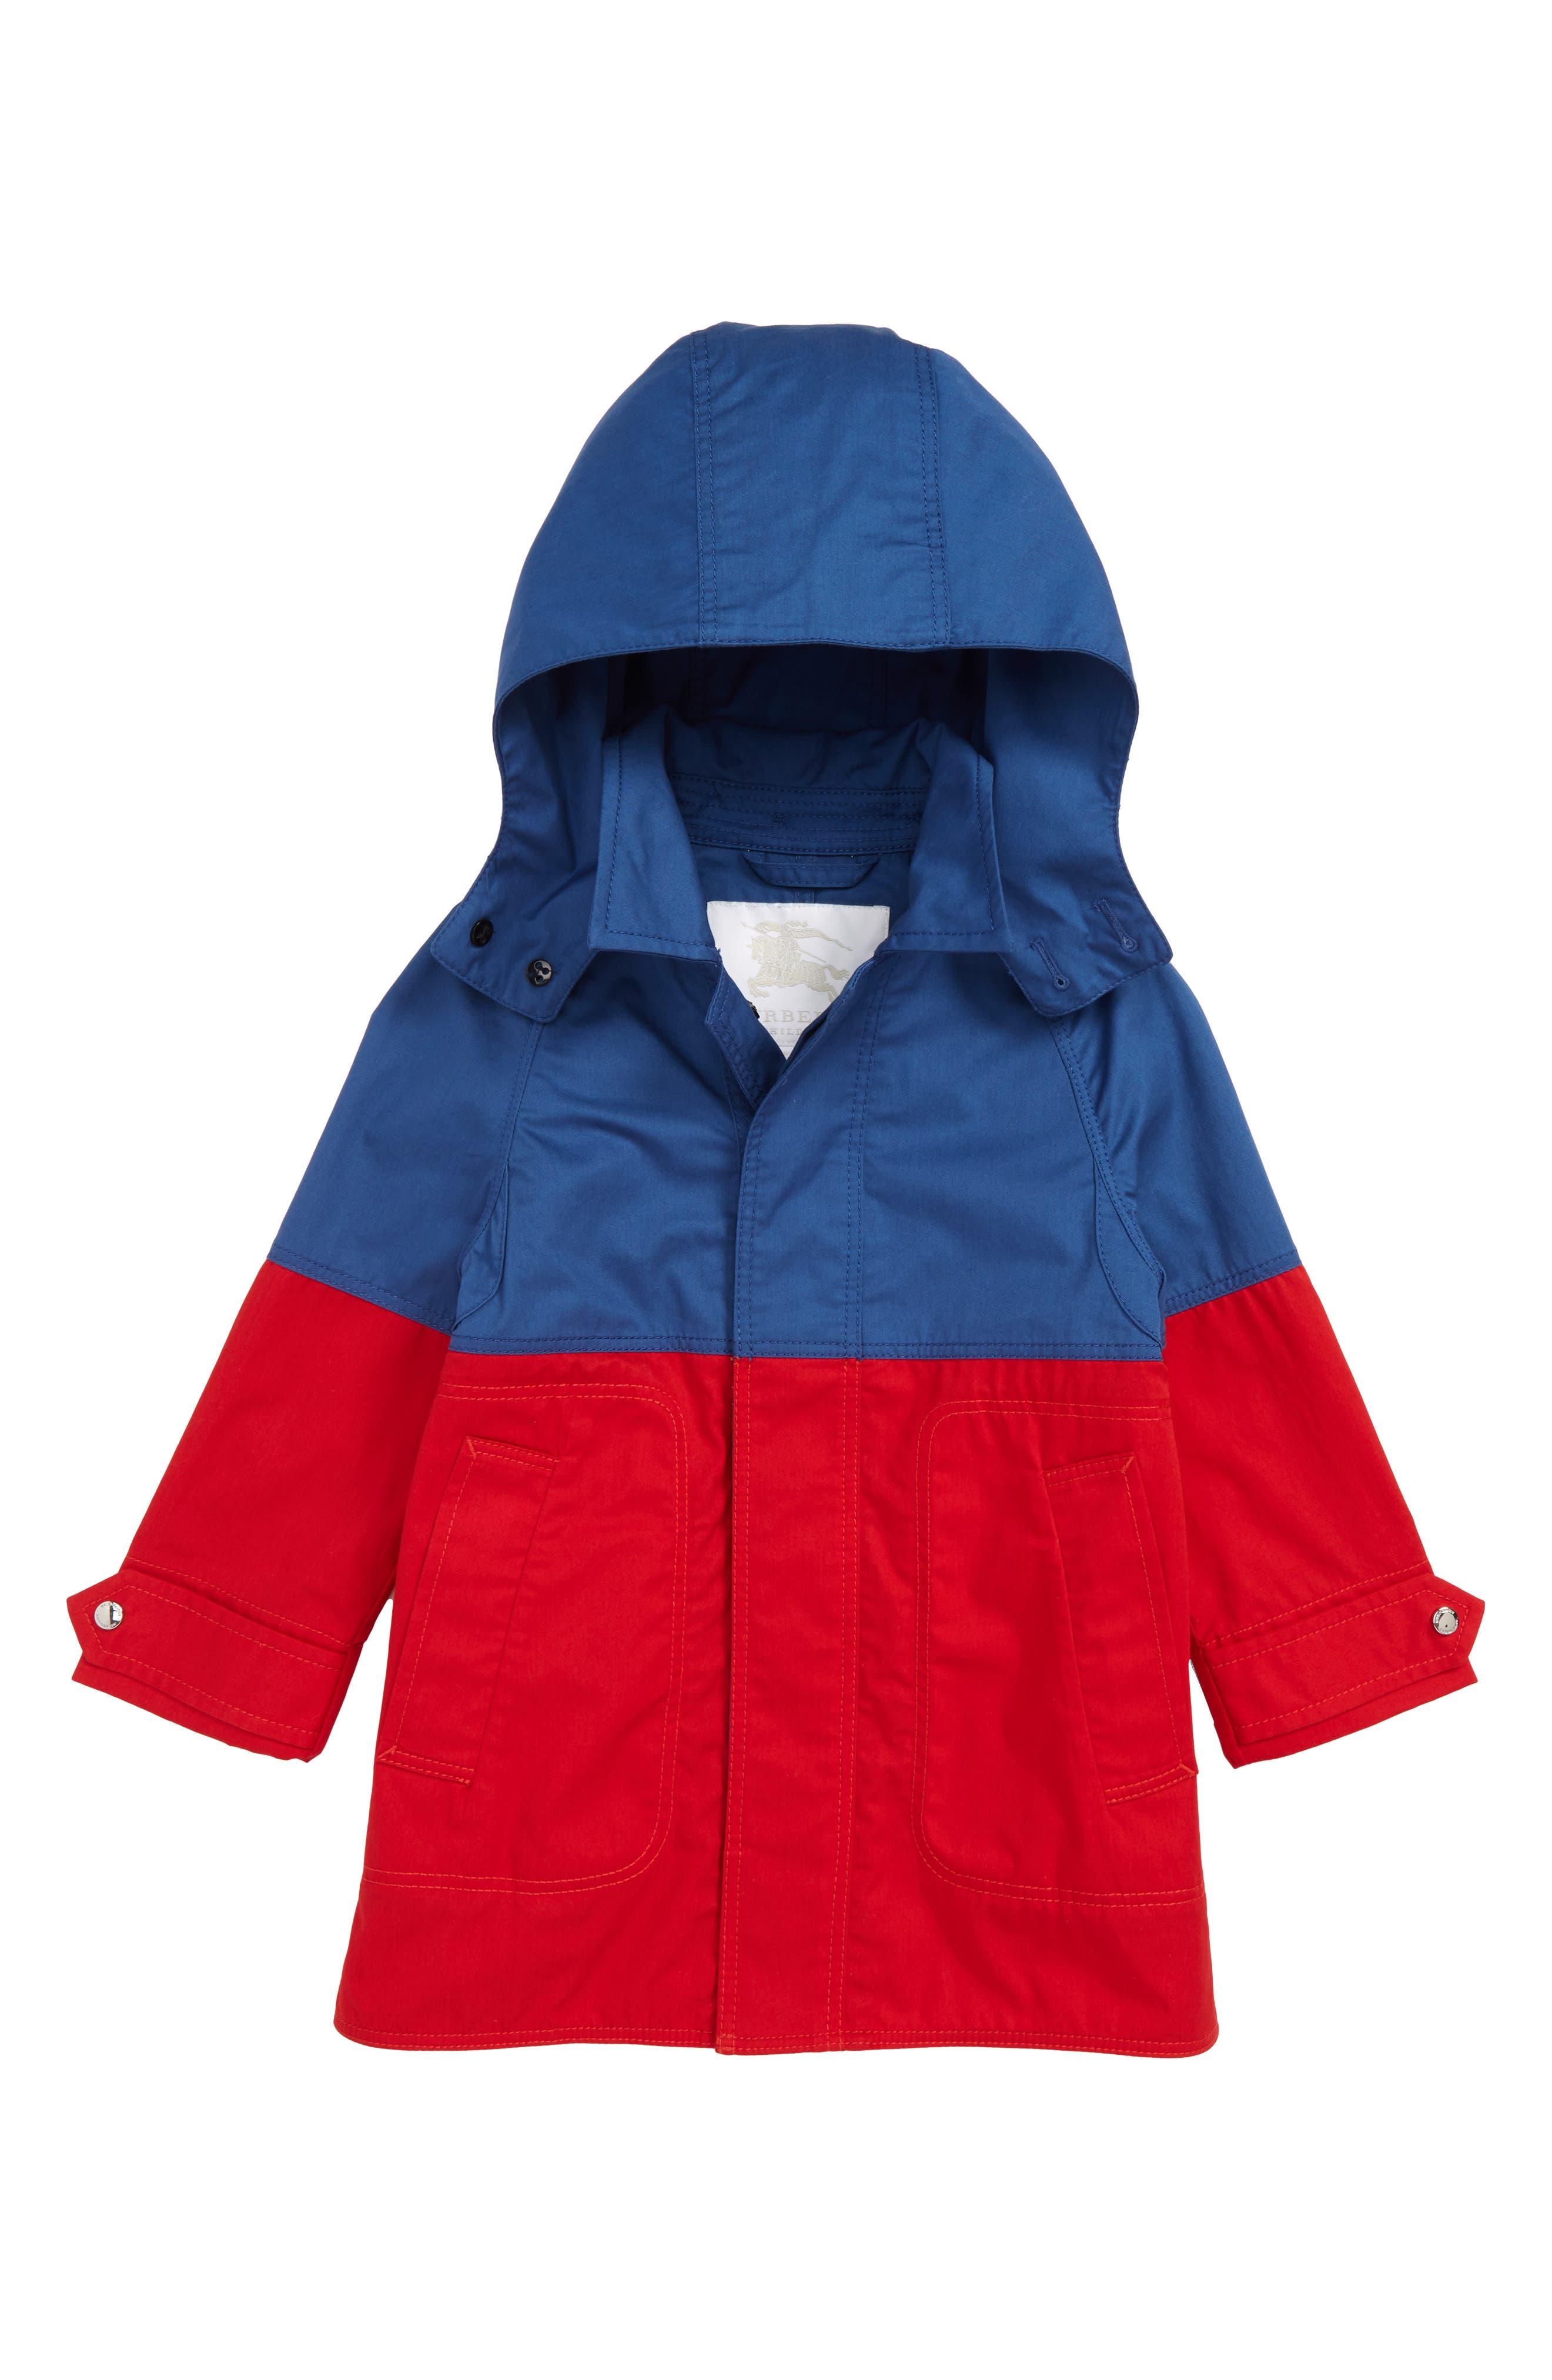 BURBERRY,                             Hunter Color Block Waterproof Hooded Coat,                             Main thumbnail 1, color,                             DUSTY BLUE